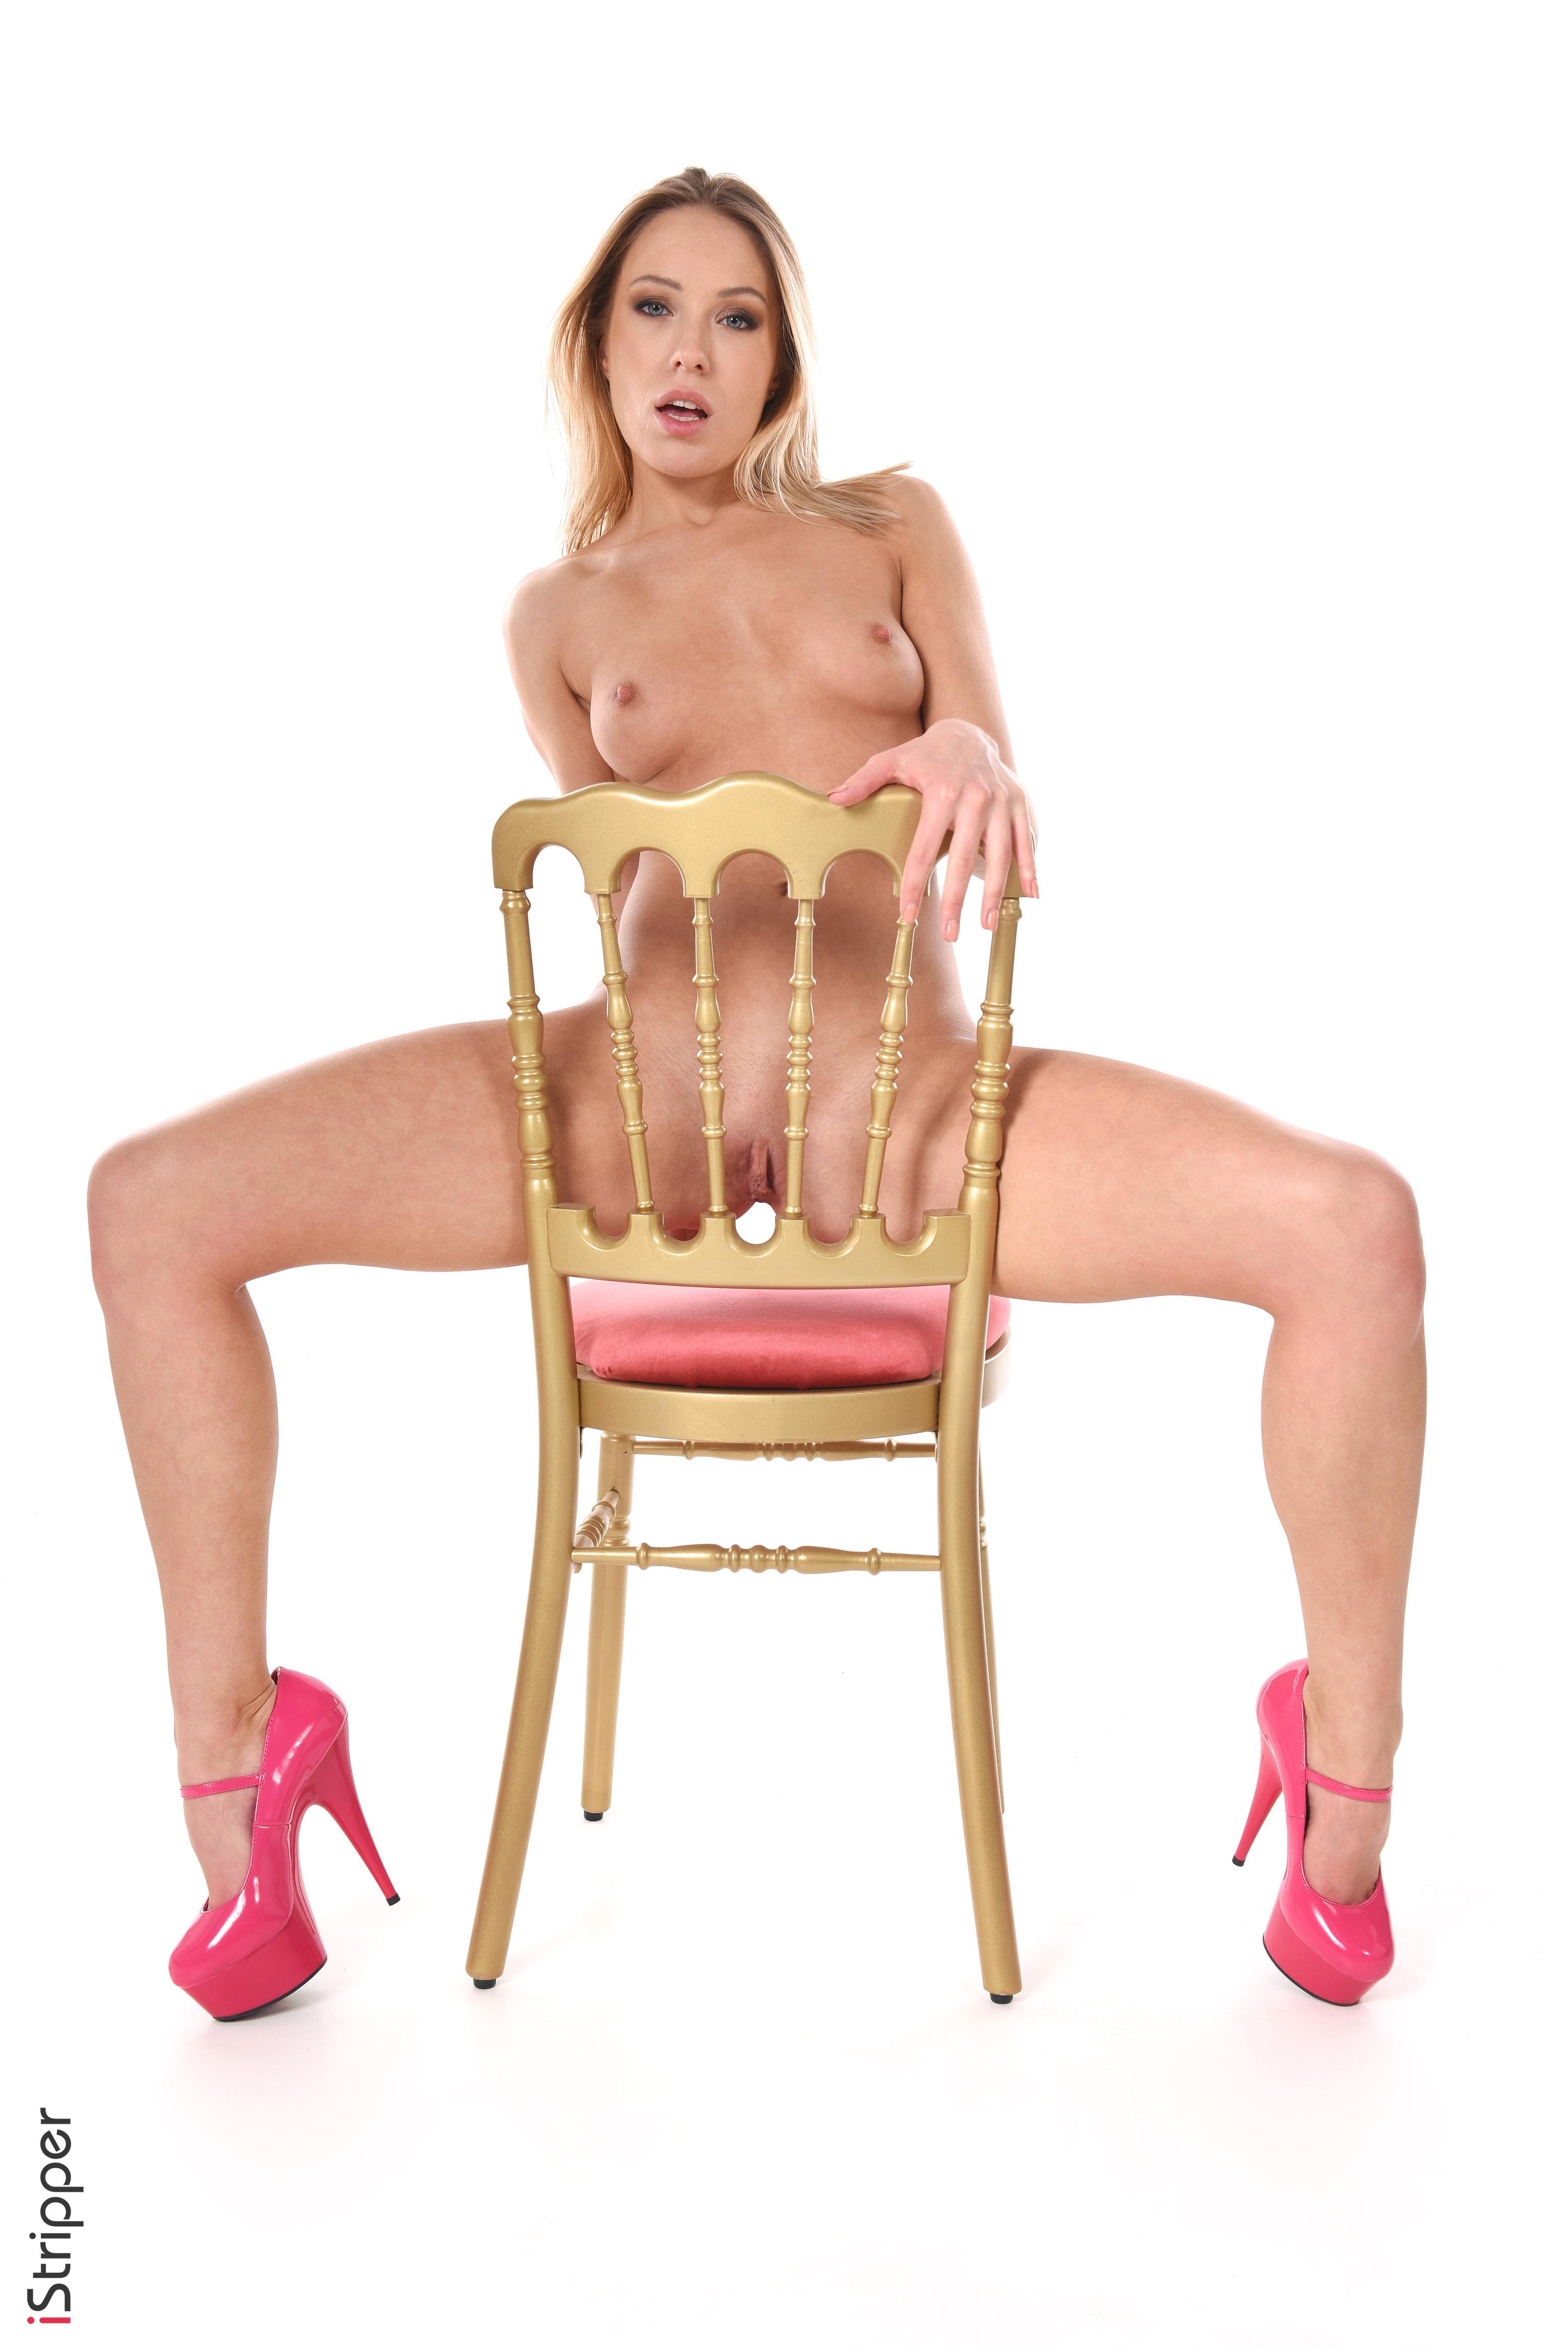 naked girls erotic pics